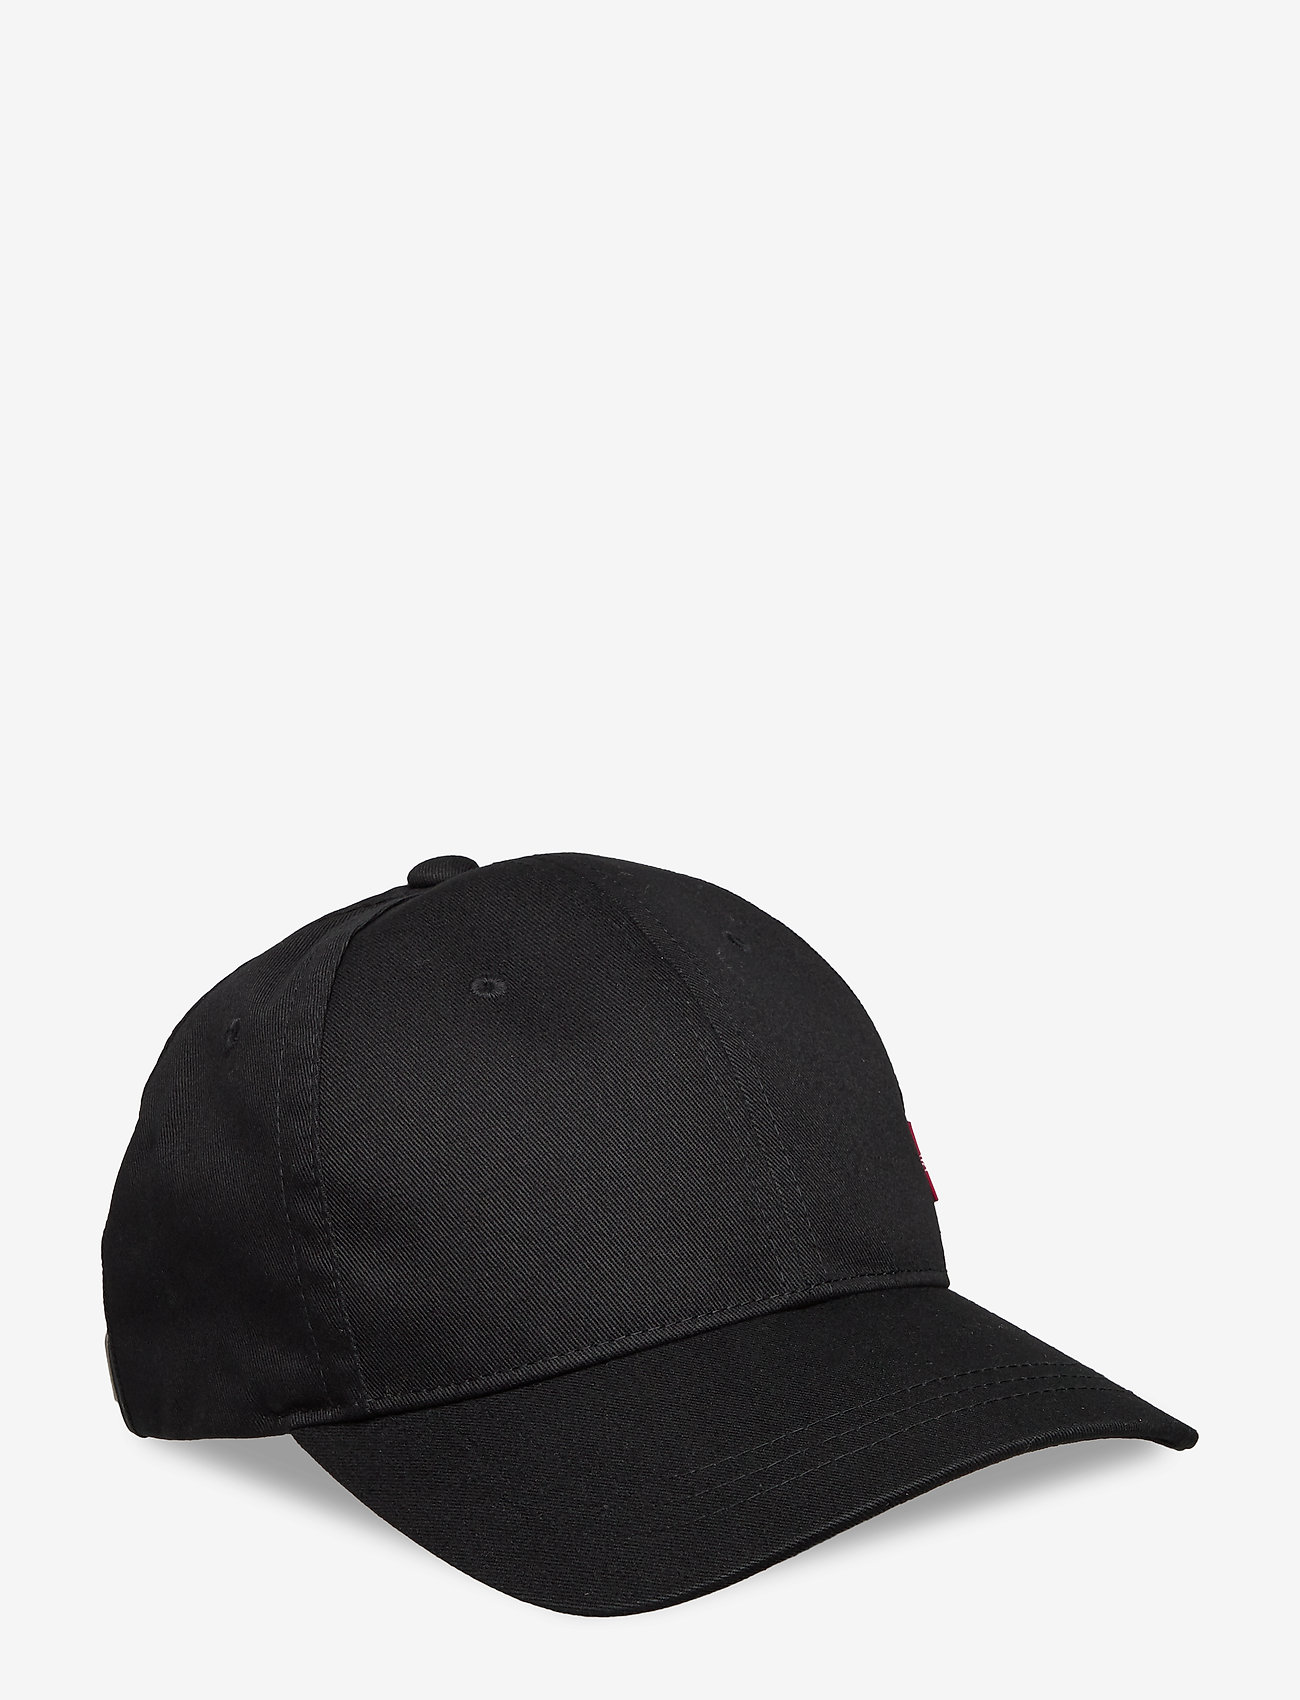 Levi's Footwear & Acc - CLASSIC TWILL RED TAB BASEBALL CAP - kepsar - regular black - 0